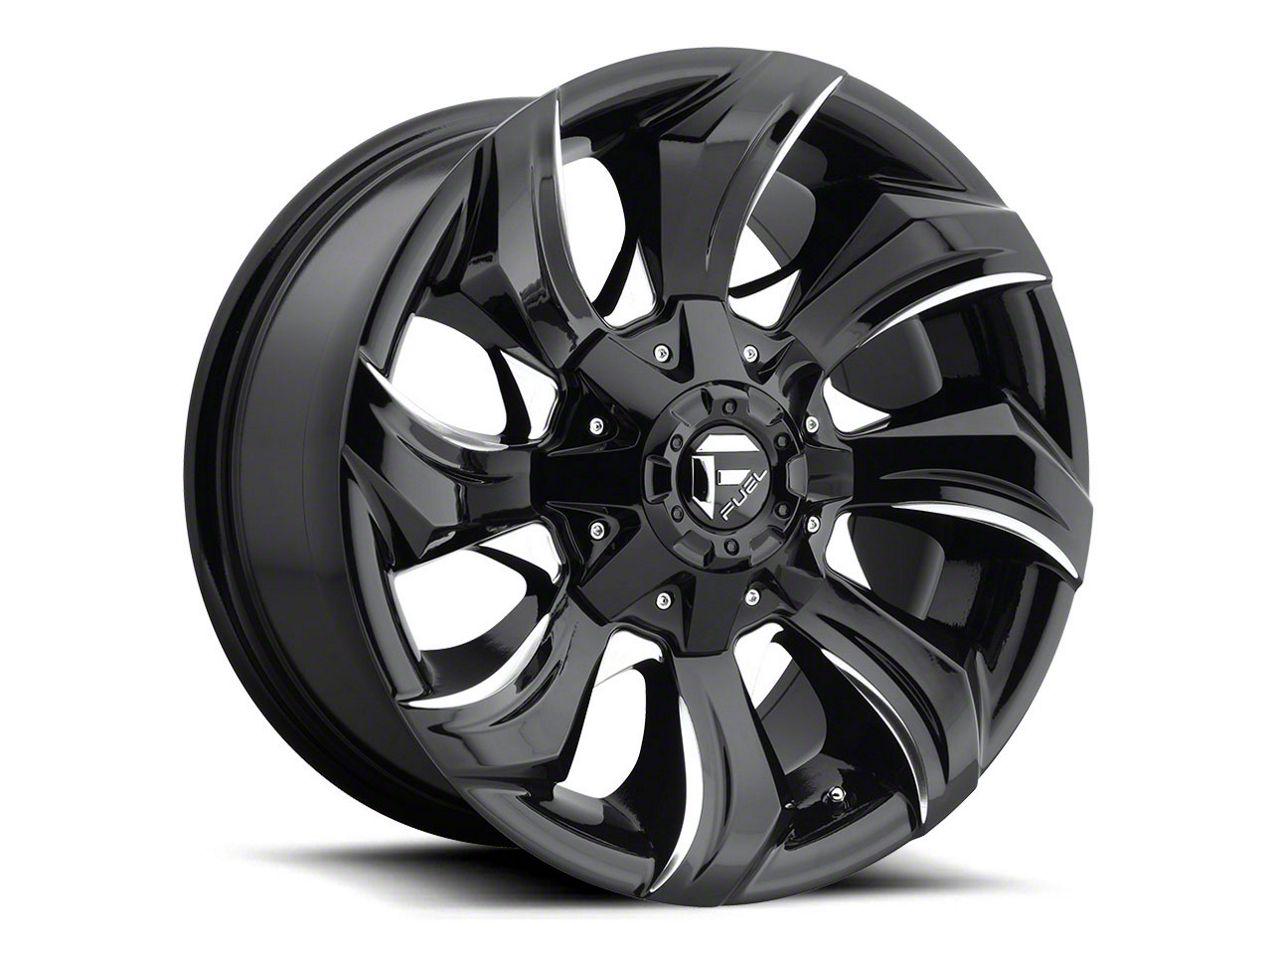 Fuel Wheels STRYKR Gloss Black Milled 5-Lug Wheel - 20x10 (02-18 RAM 1500, Excluding Mega Cab)